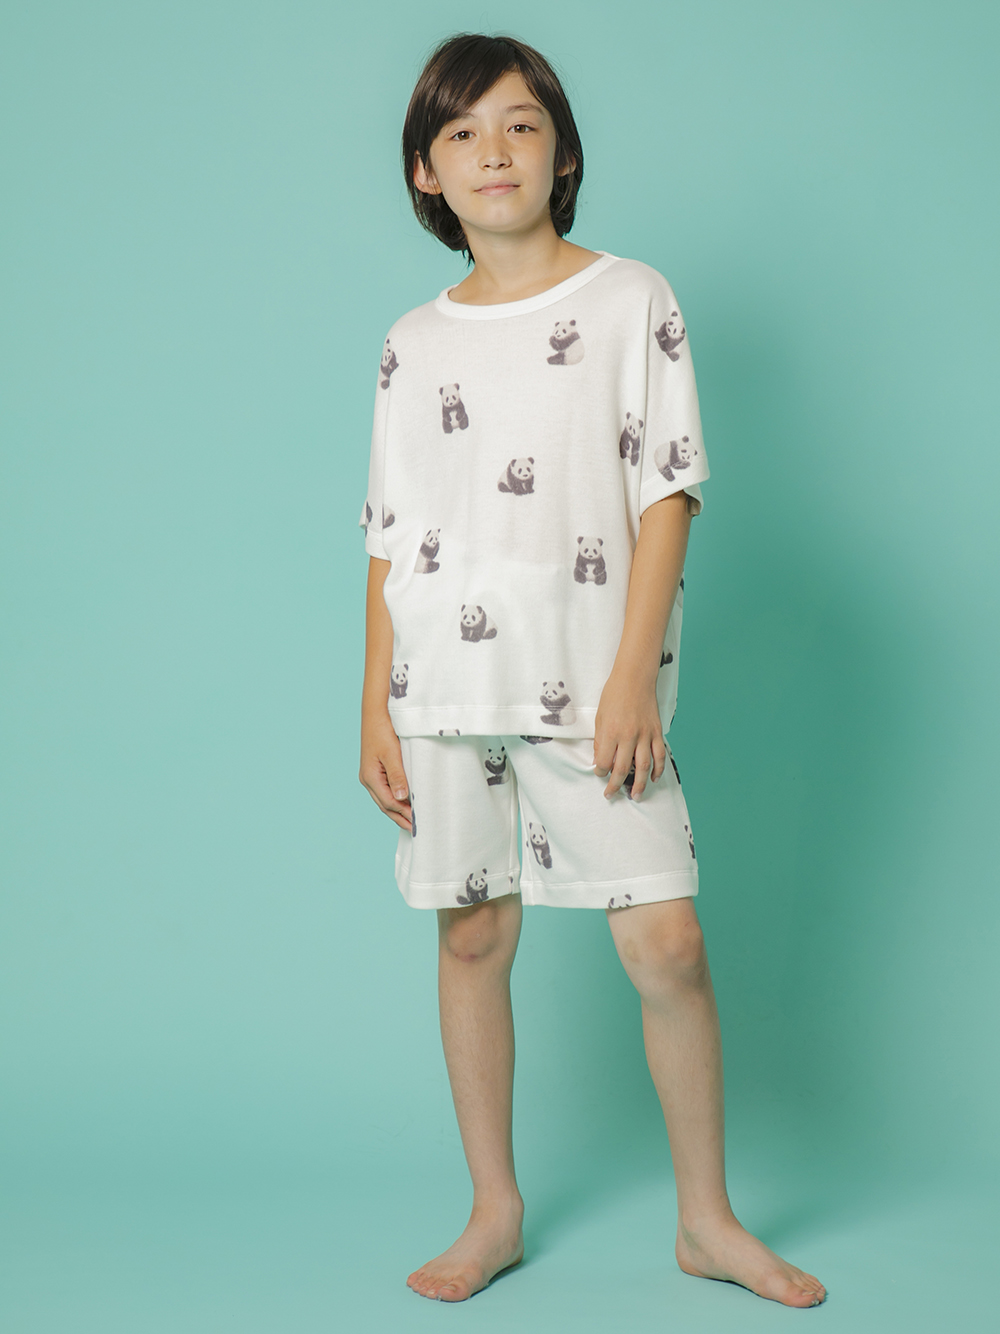 【ONLINE限定】【JUNIOR】熊貓圖案上衣&短褲